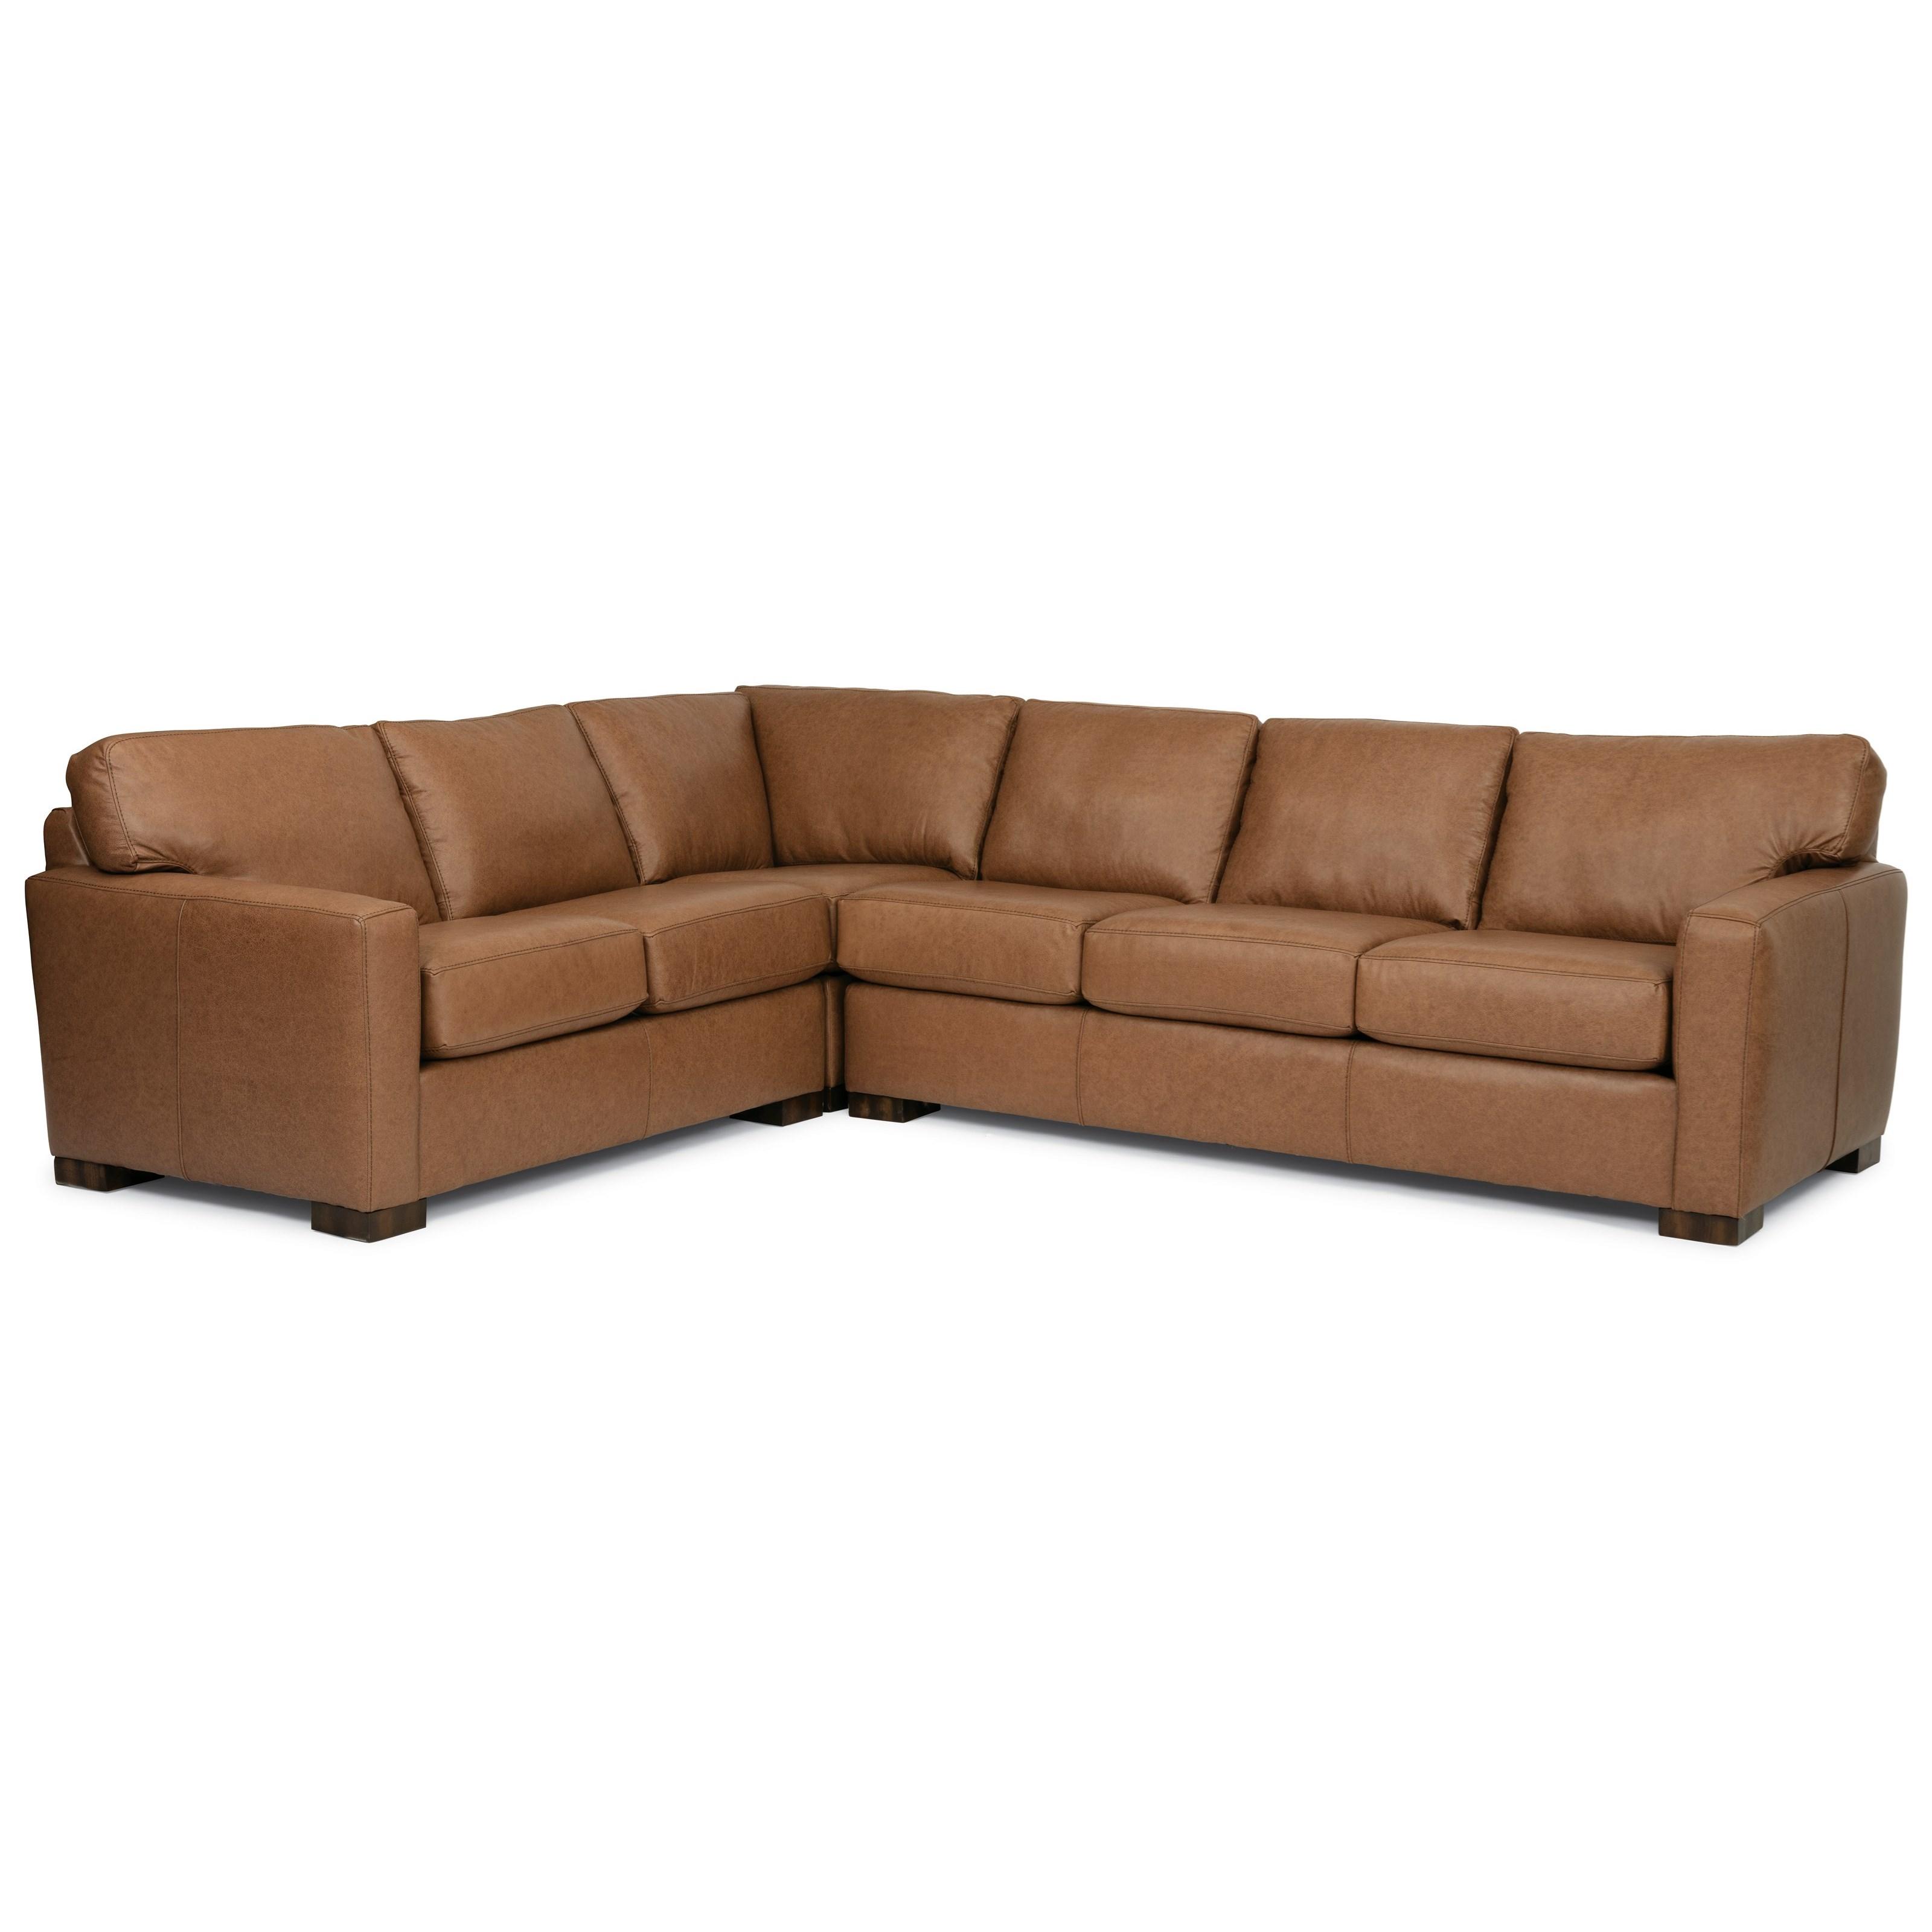 Bryant Sectional Sofa by Flexsteel at Jordan's Home Furnishings